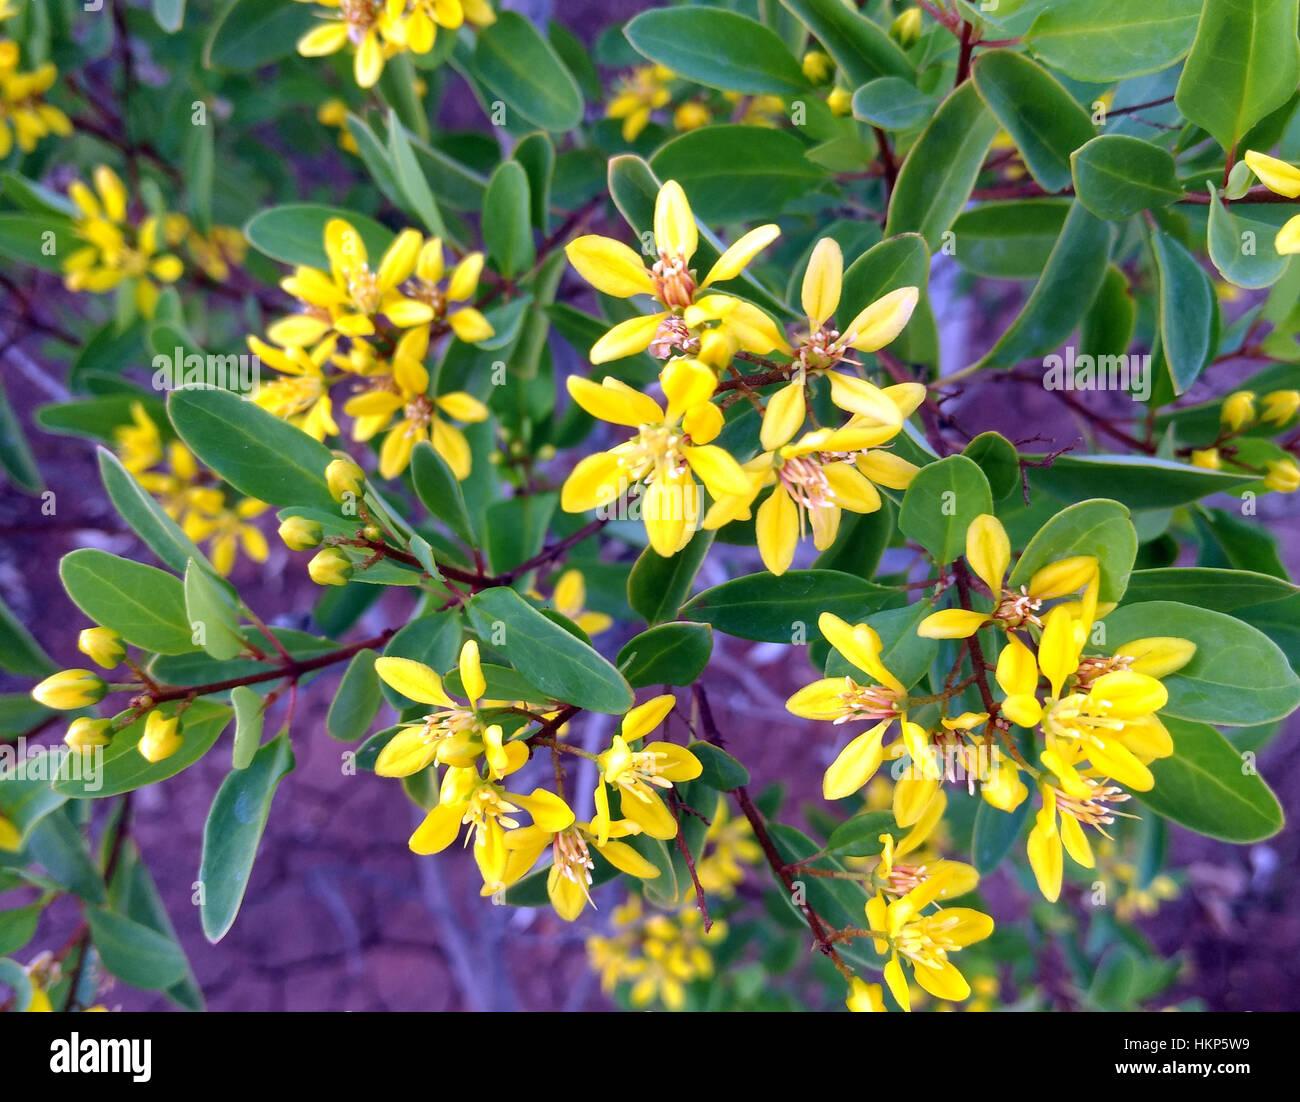 Yellow garden flowers with five petals stock photo 132638613 alamy yellow garden flowers with five petals mightylinksfo